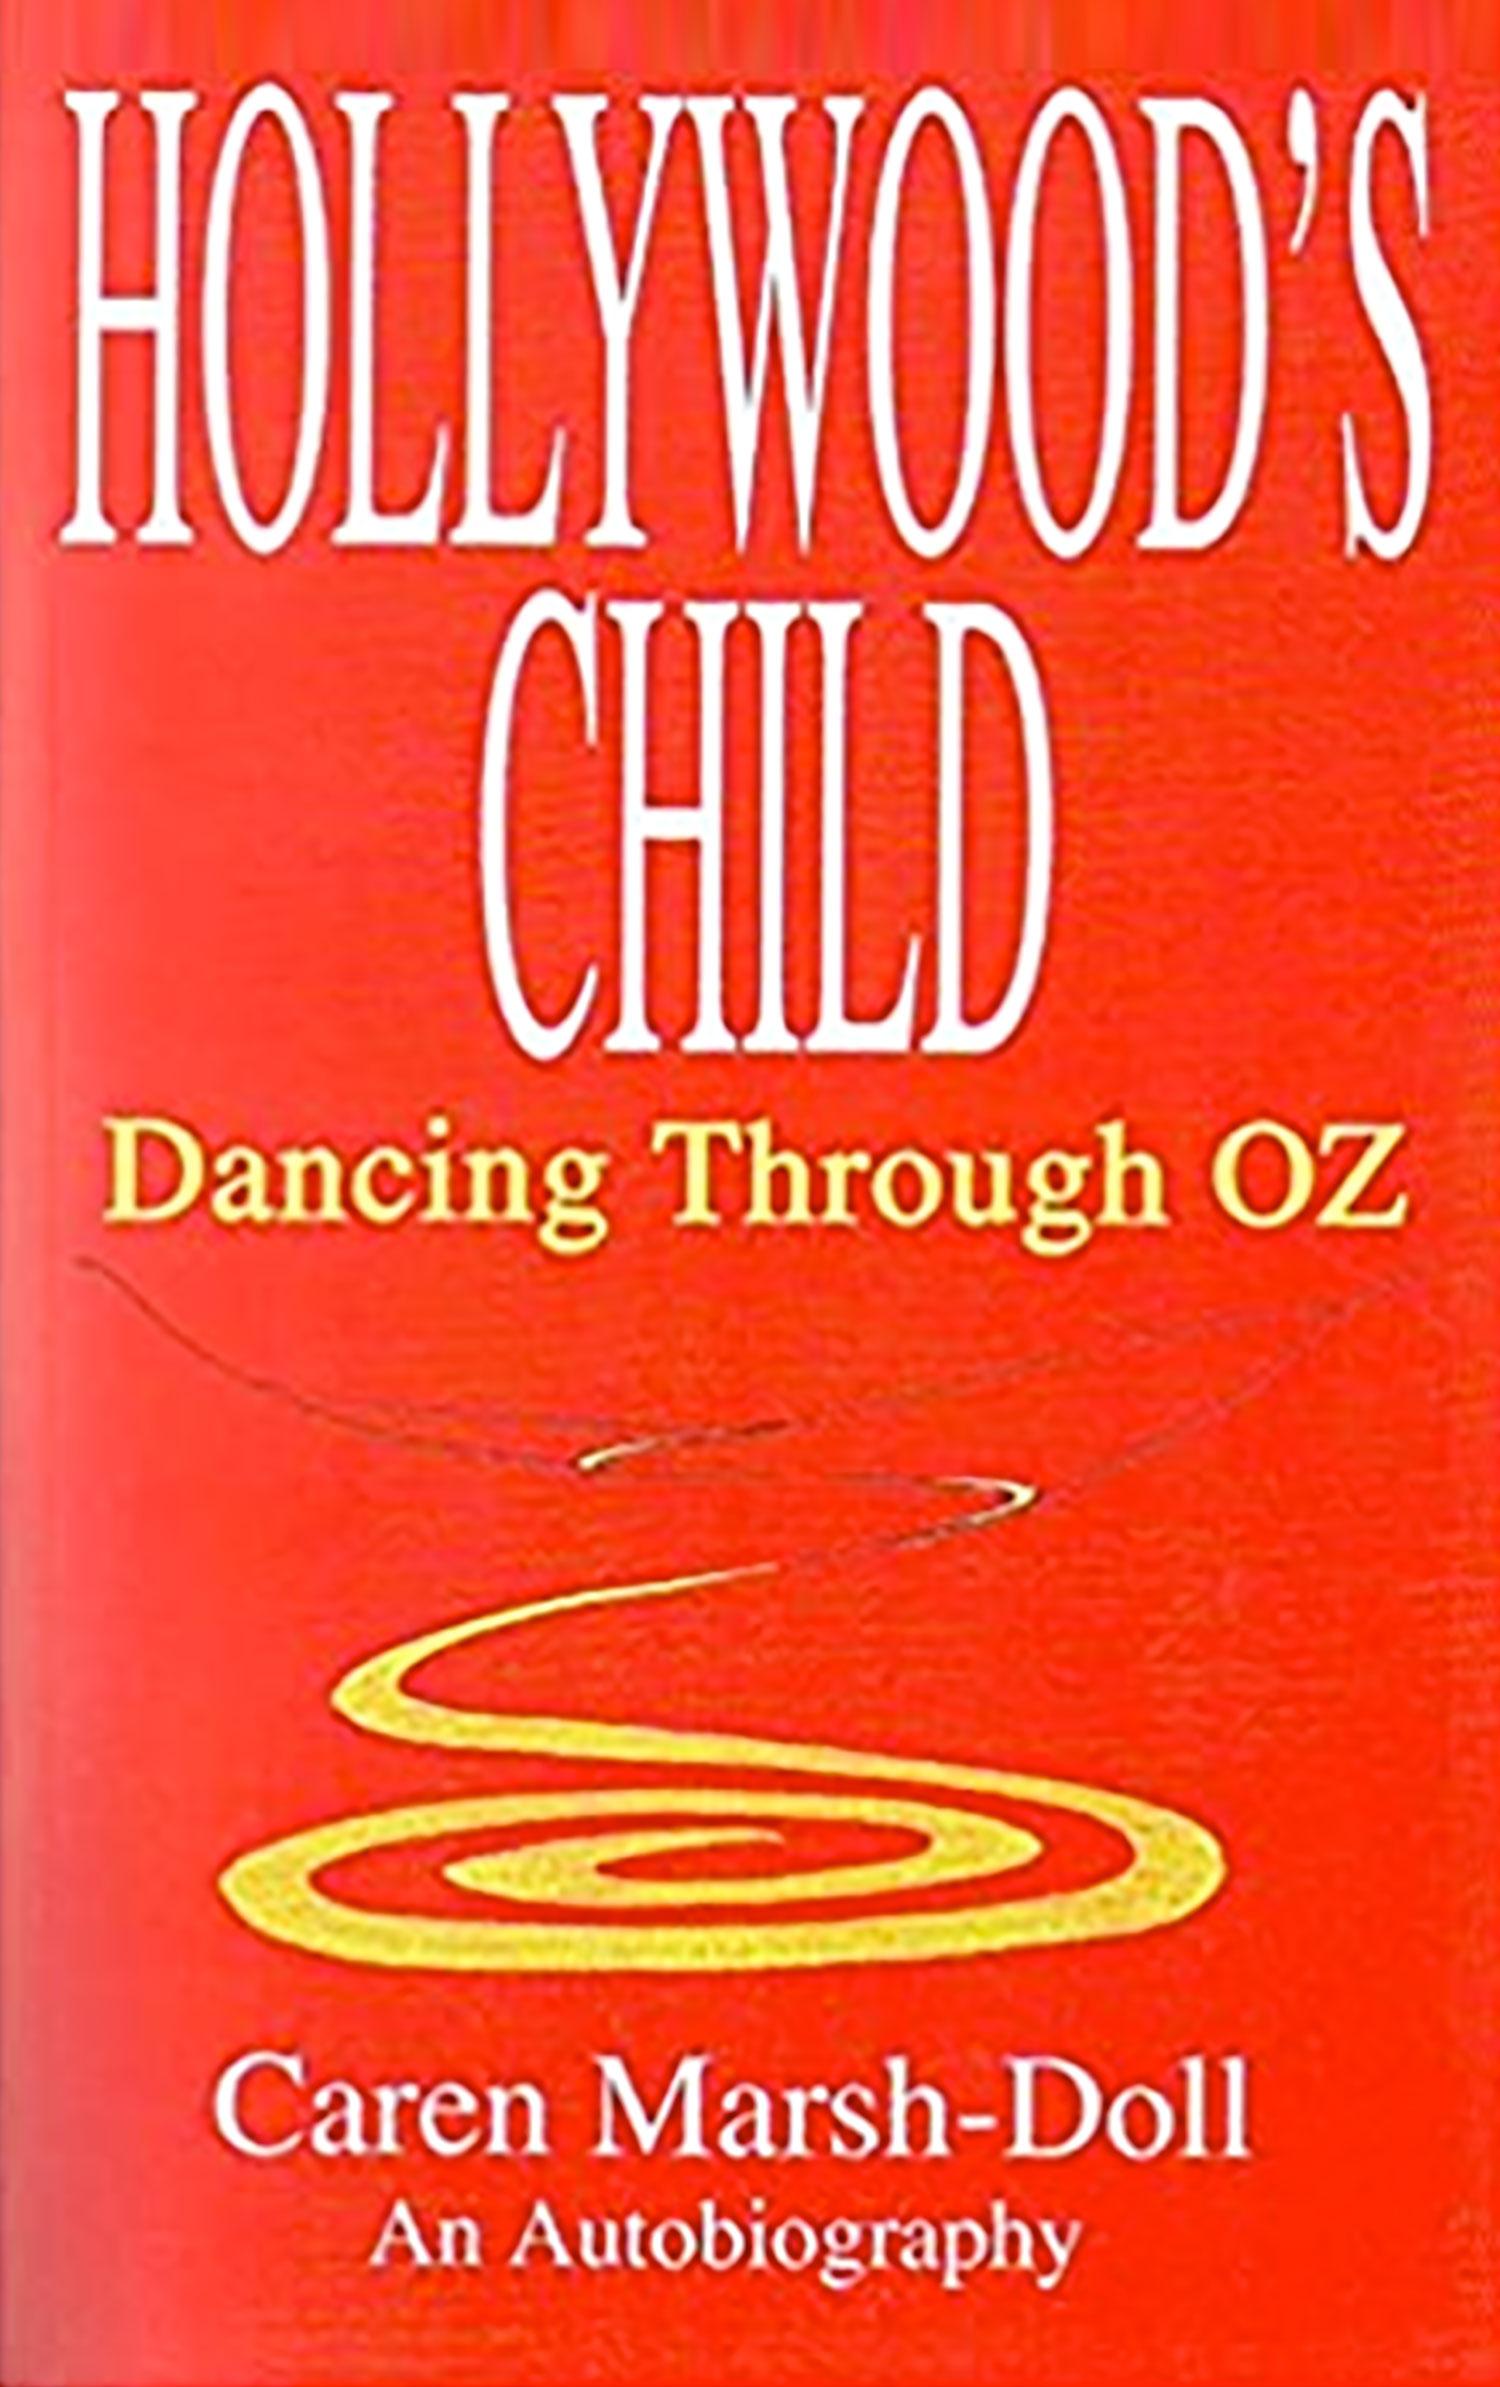 Hollywood's Child Dancing Through OZ